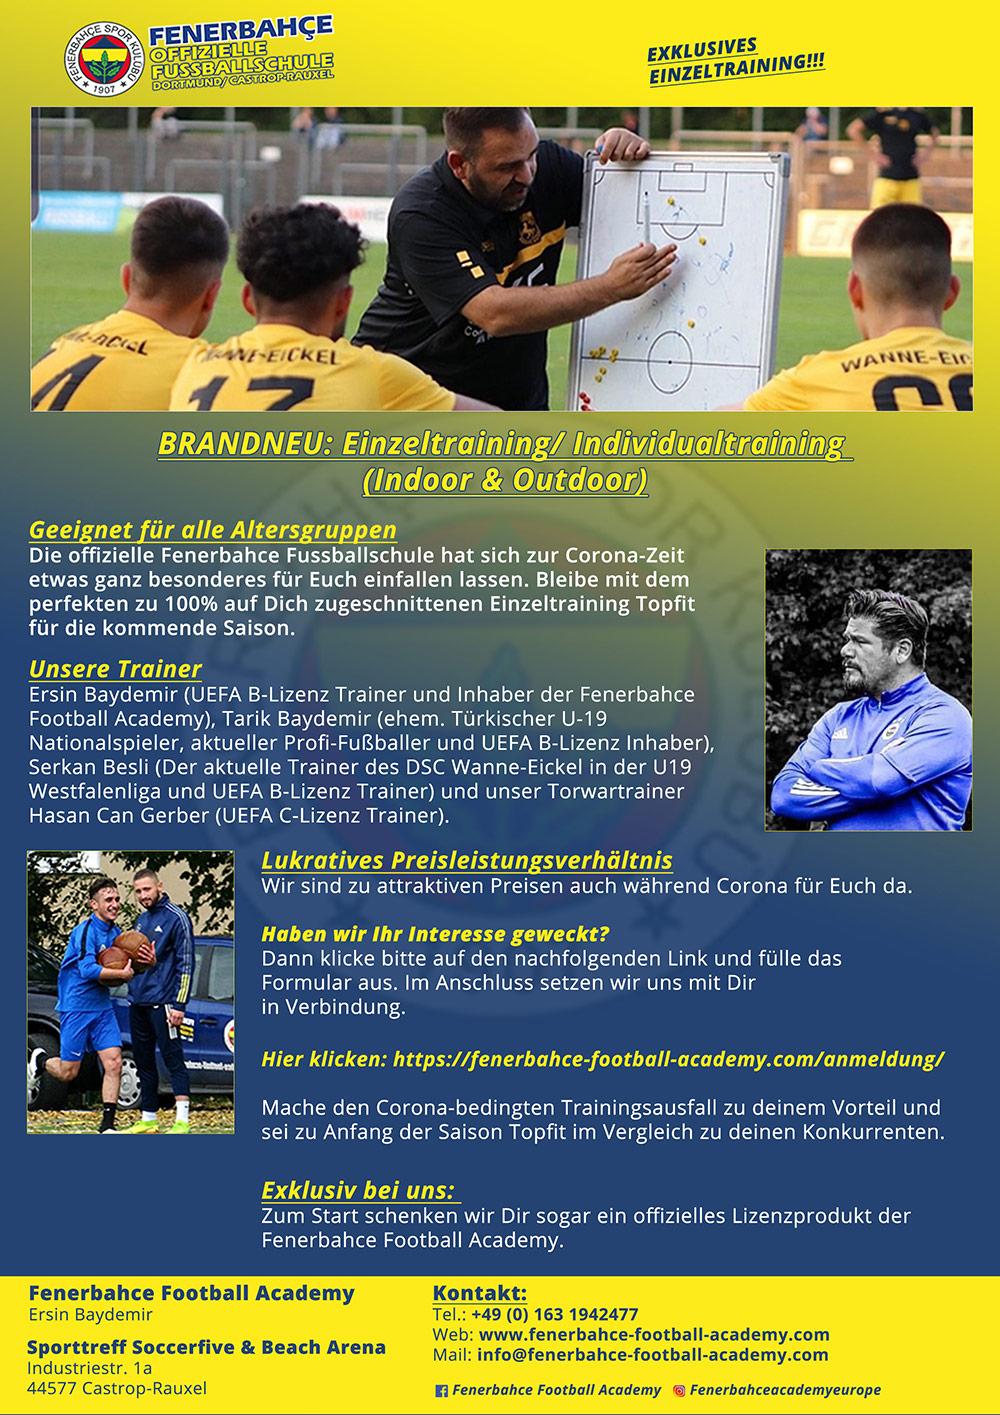 Fenerbahce Football Academy Europa Dortmund Castrop Rauxel